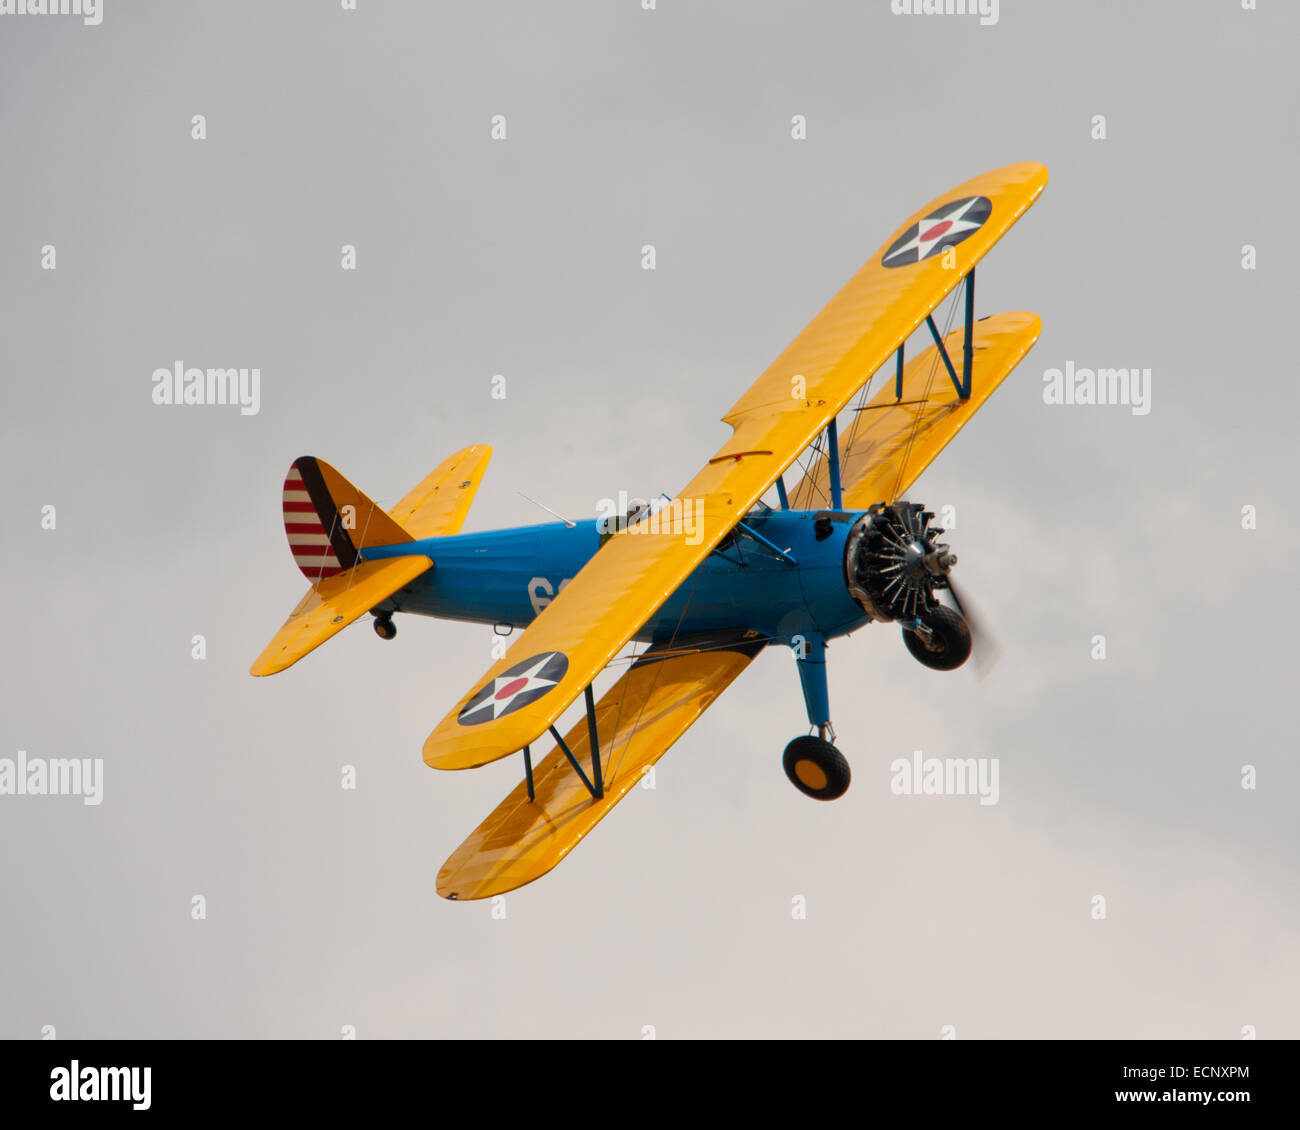 US Army Boeing Stearman Biplane 699 - Stock Image